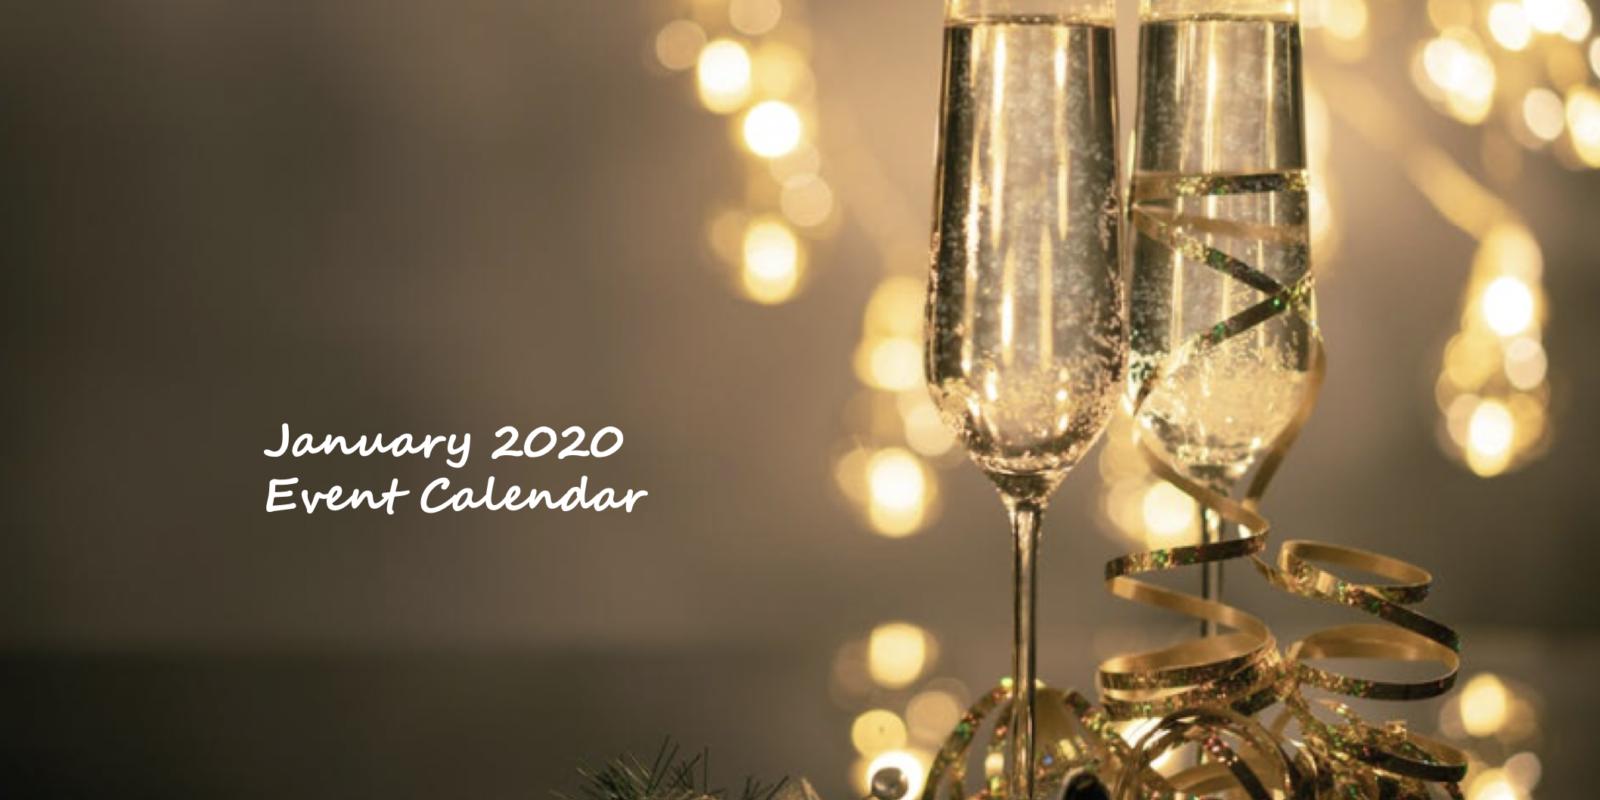 January 2020 Event Calendar